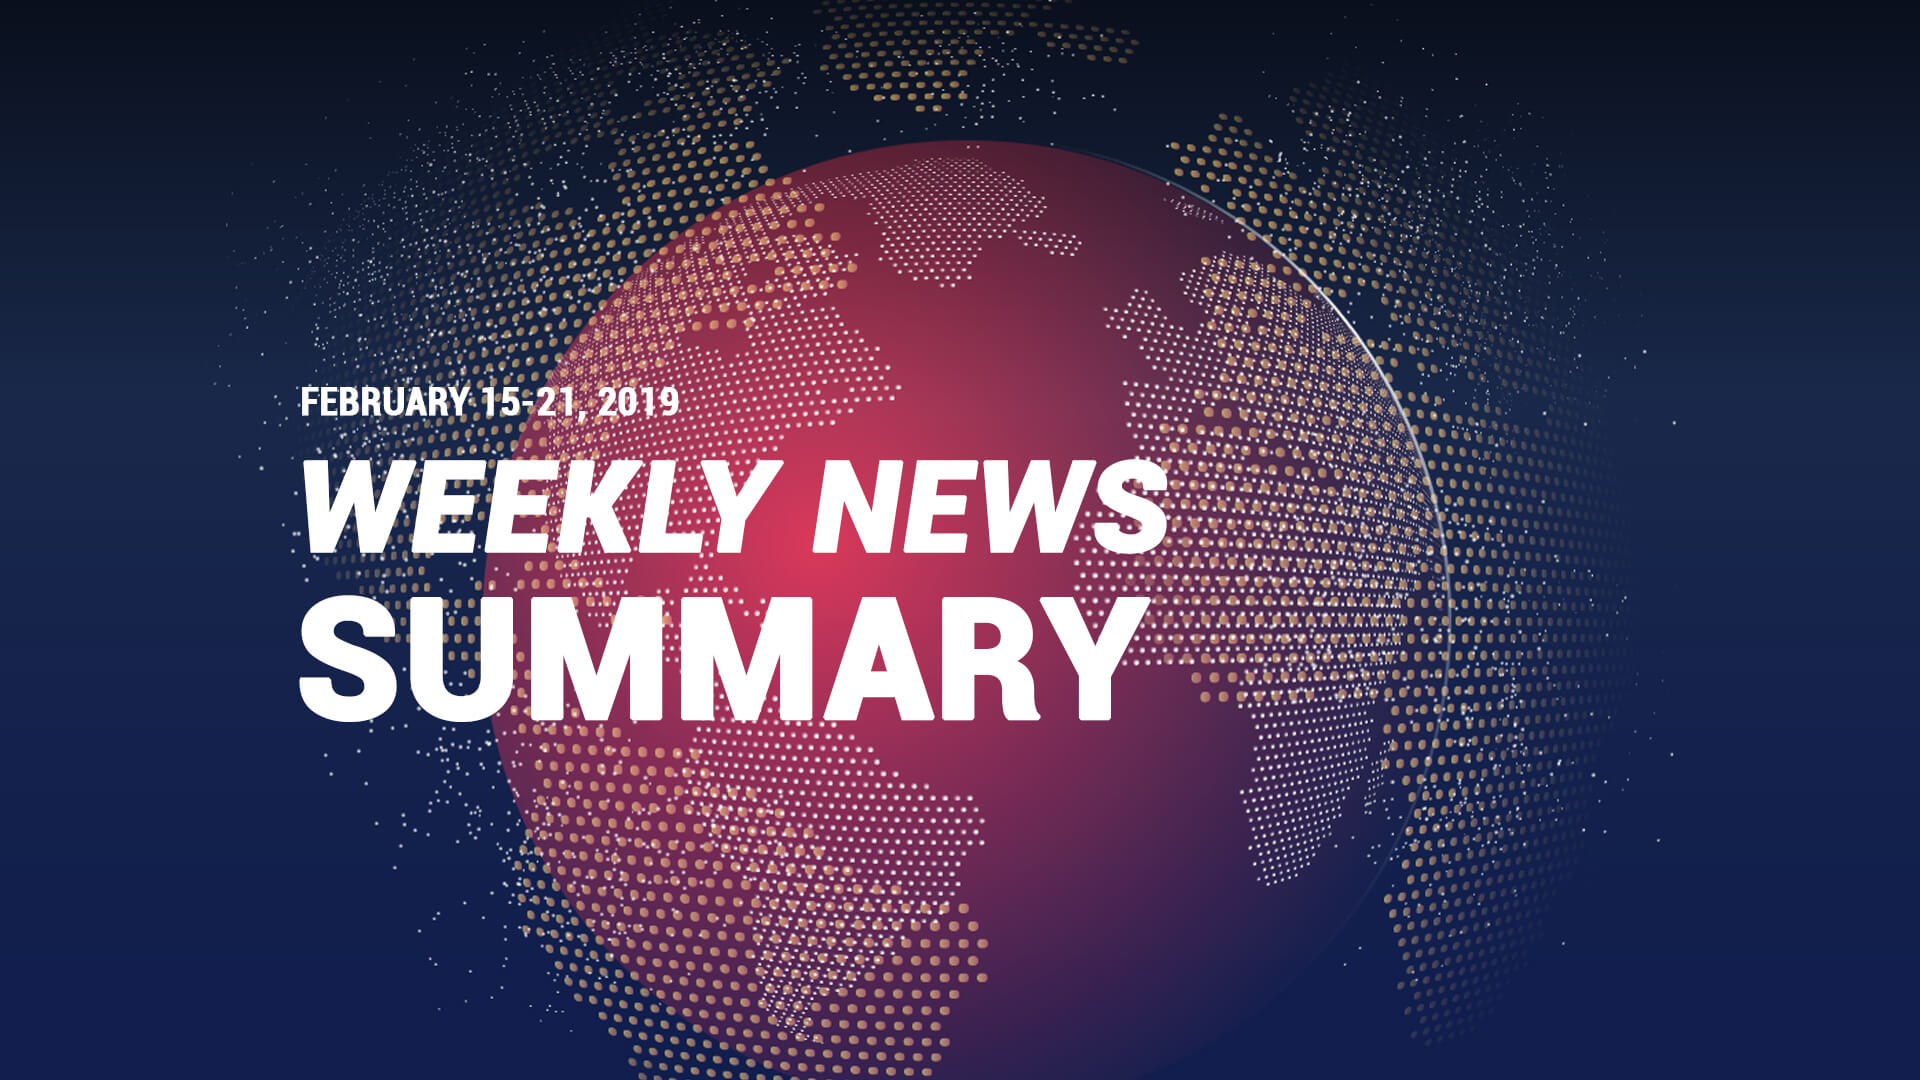 Weekly news summary for February 15-21, 2019 - Finance Brokerage